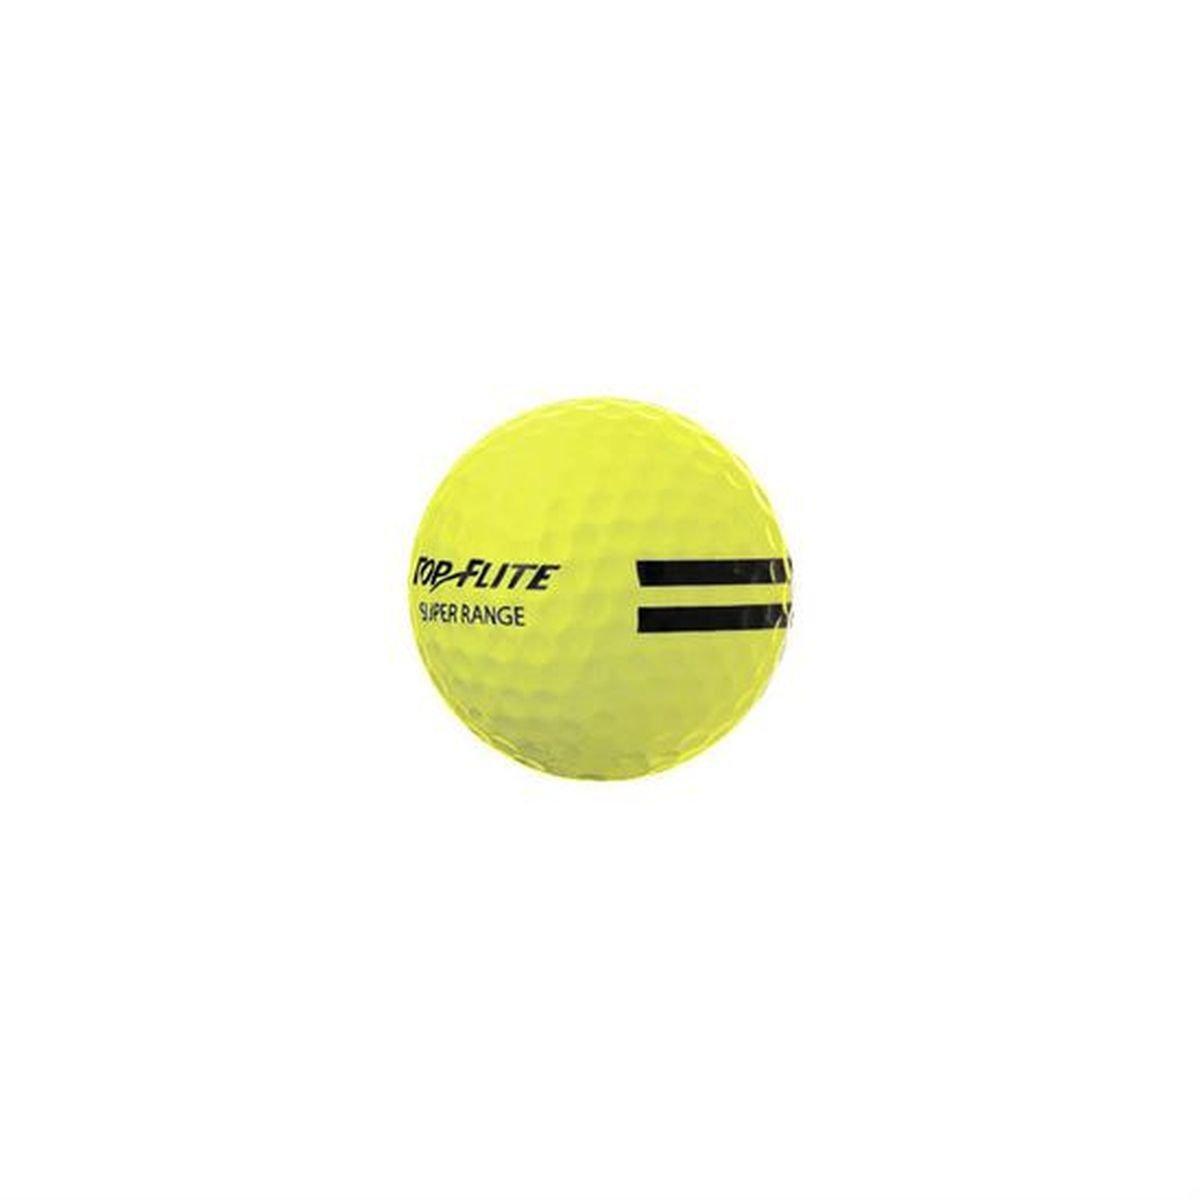 24 Pack Top Flite Super Range Golf Balls - Yellow by Top Flight